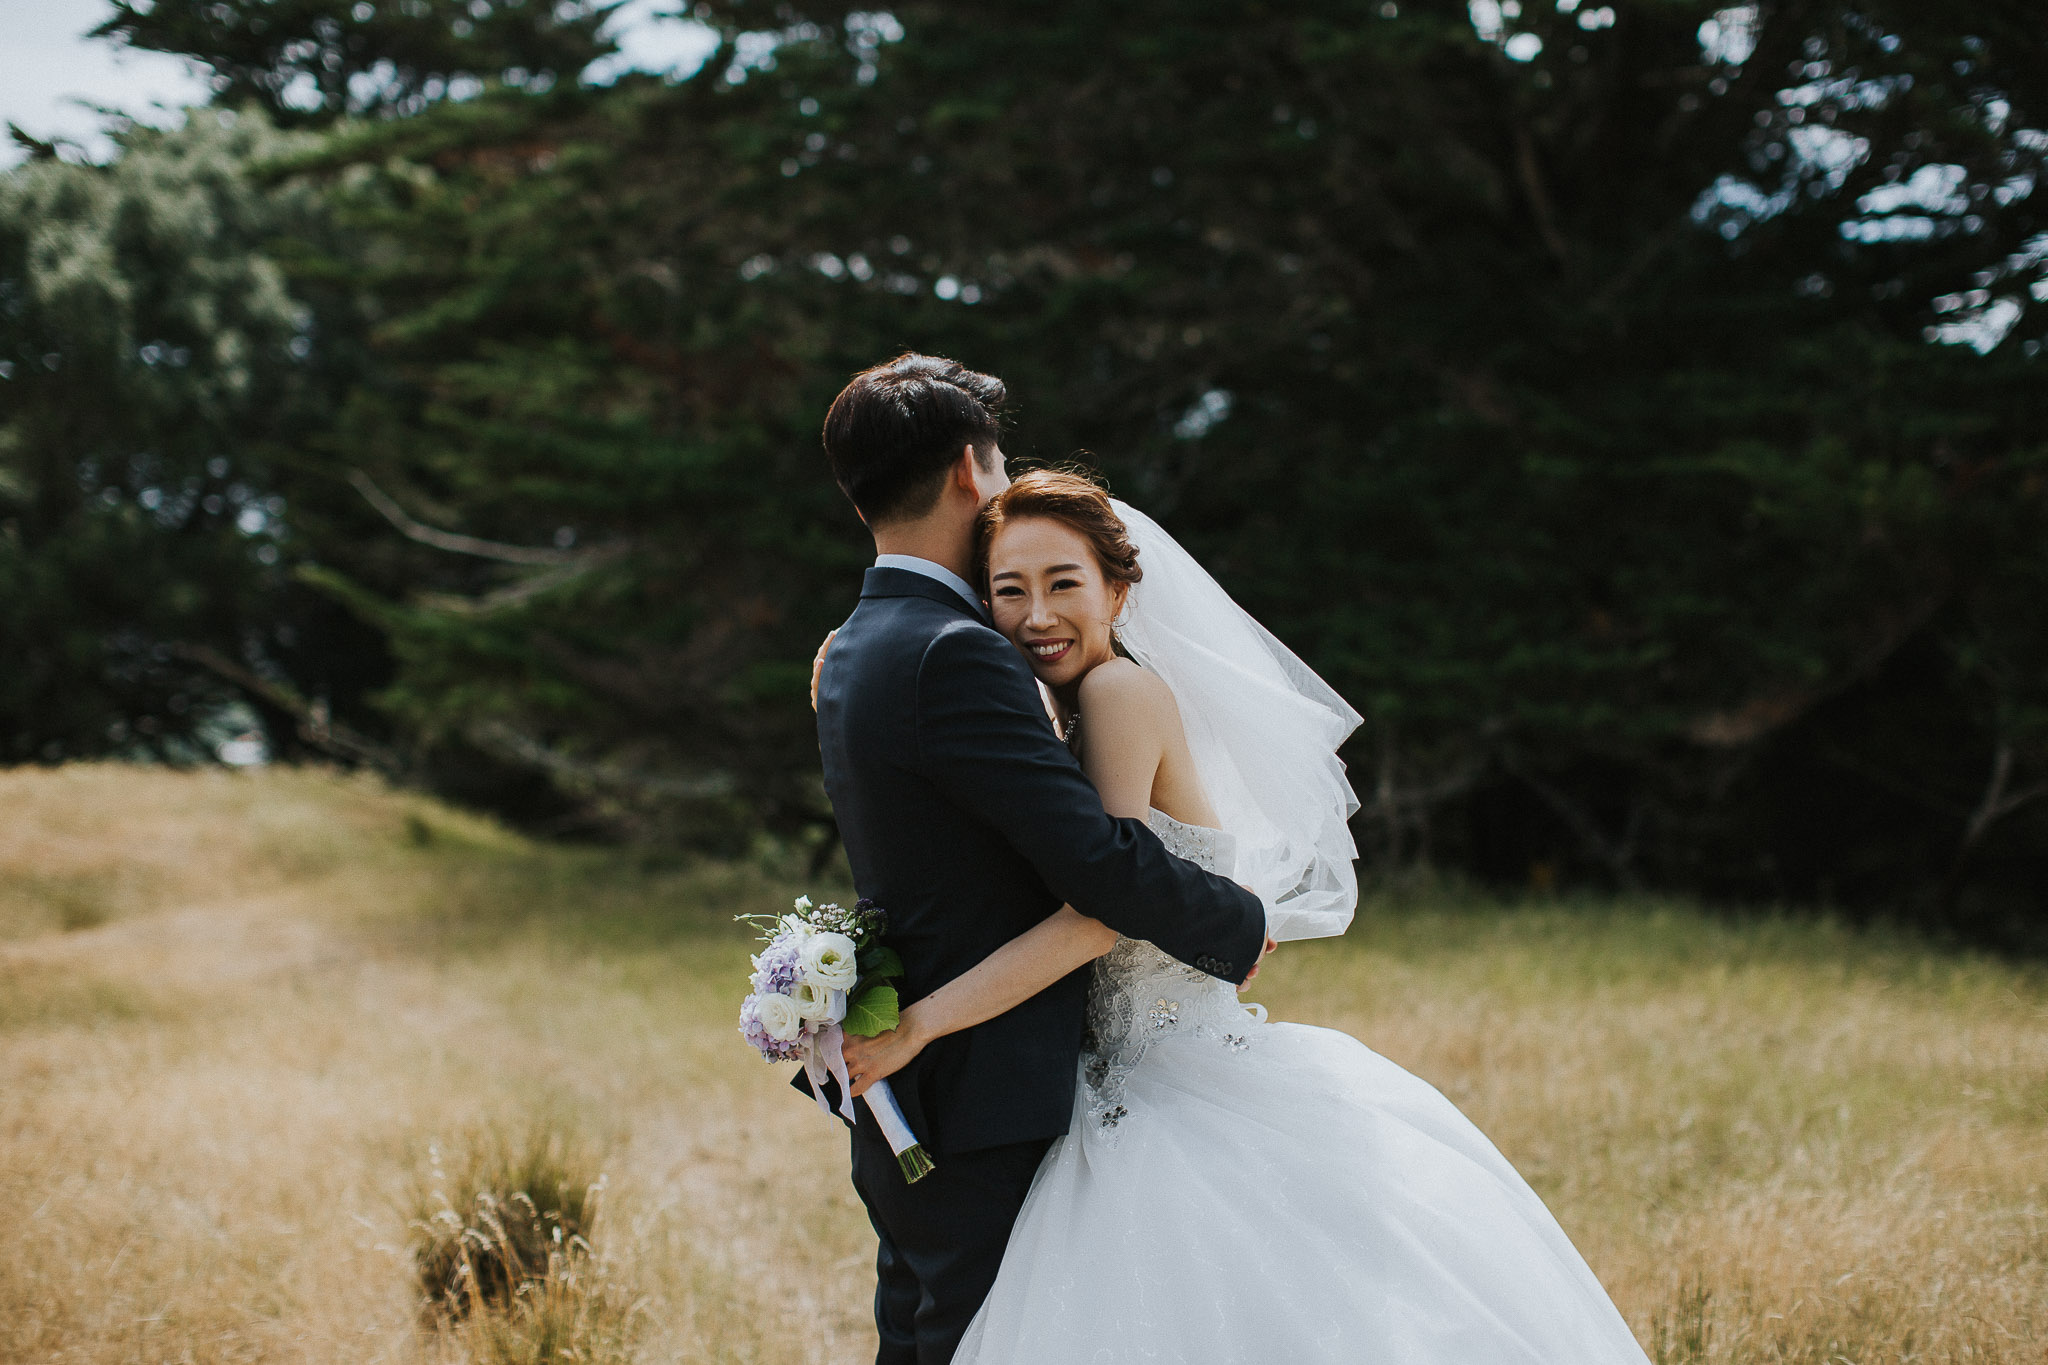 Mantells Auckland wedding photographer - Eri-Jun-45.jpg